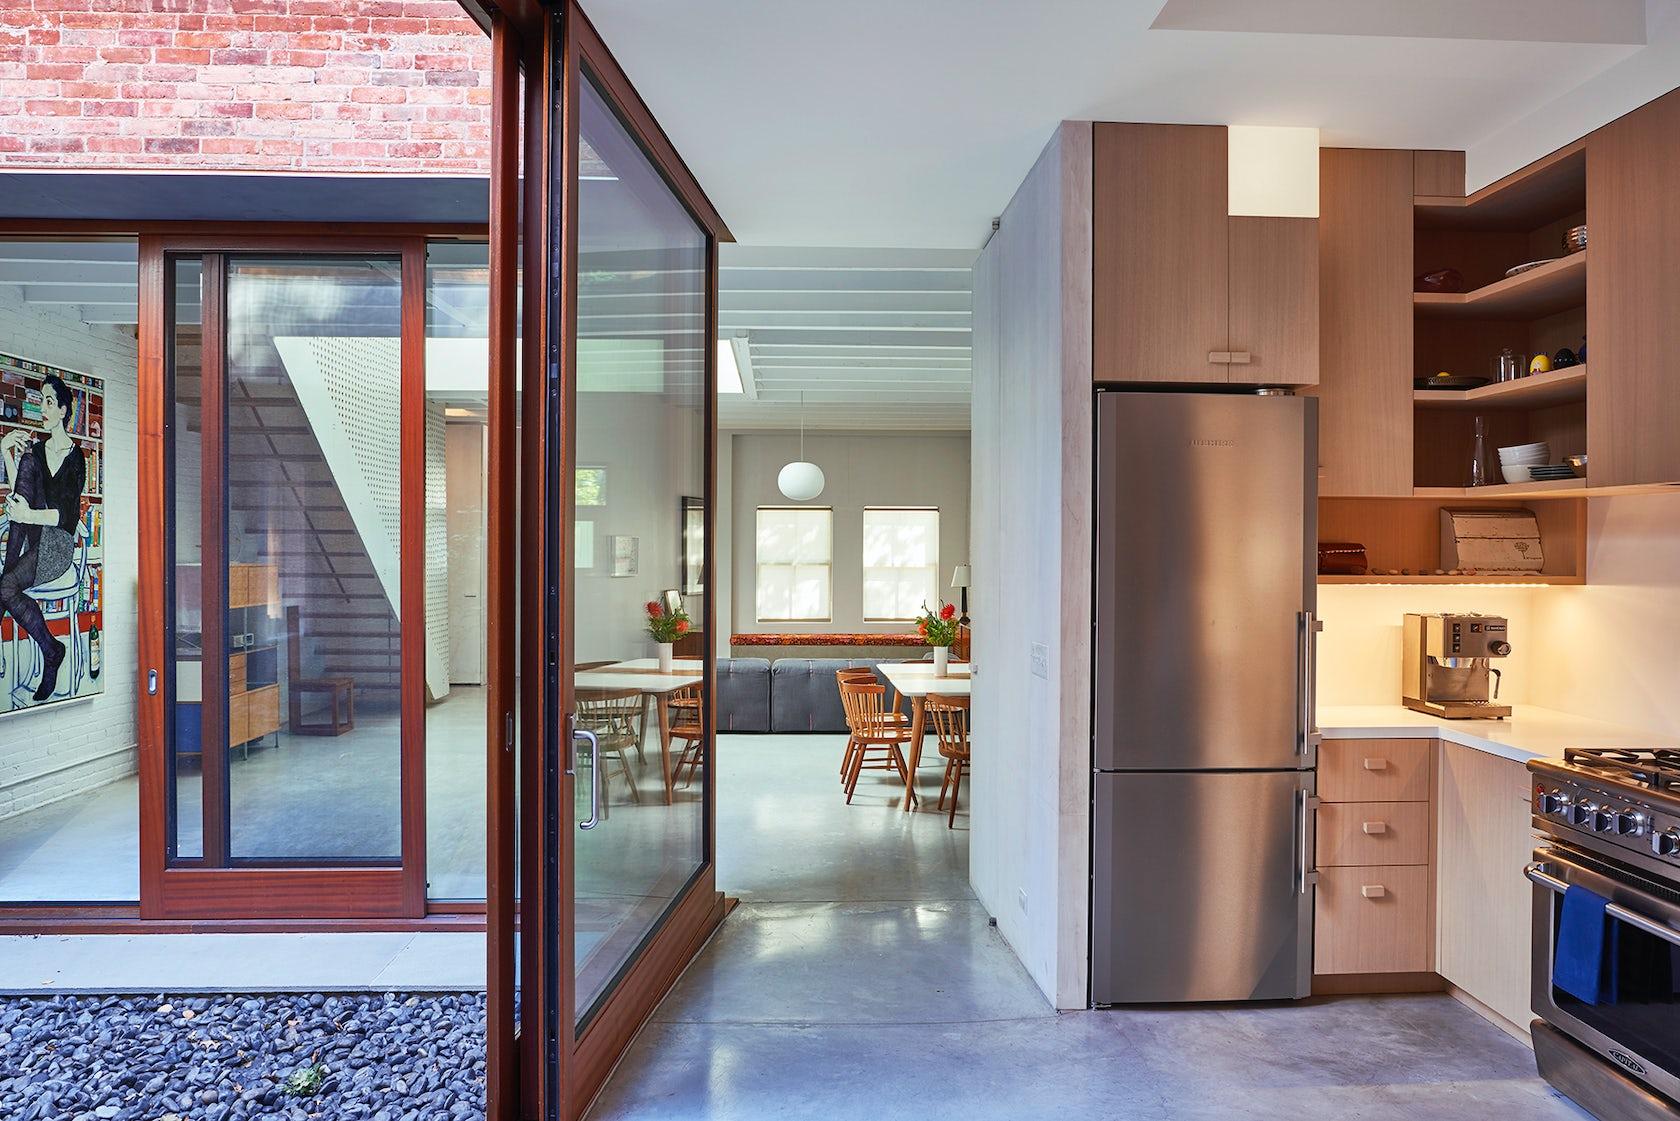 Clinton hill courtyard house architizer - Residential interior design jobs ...